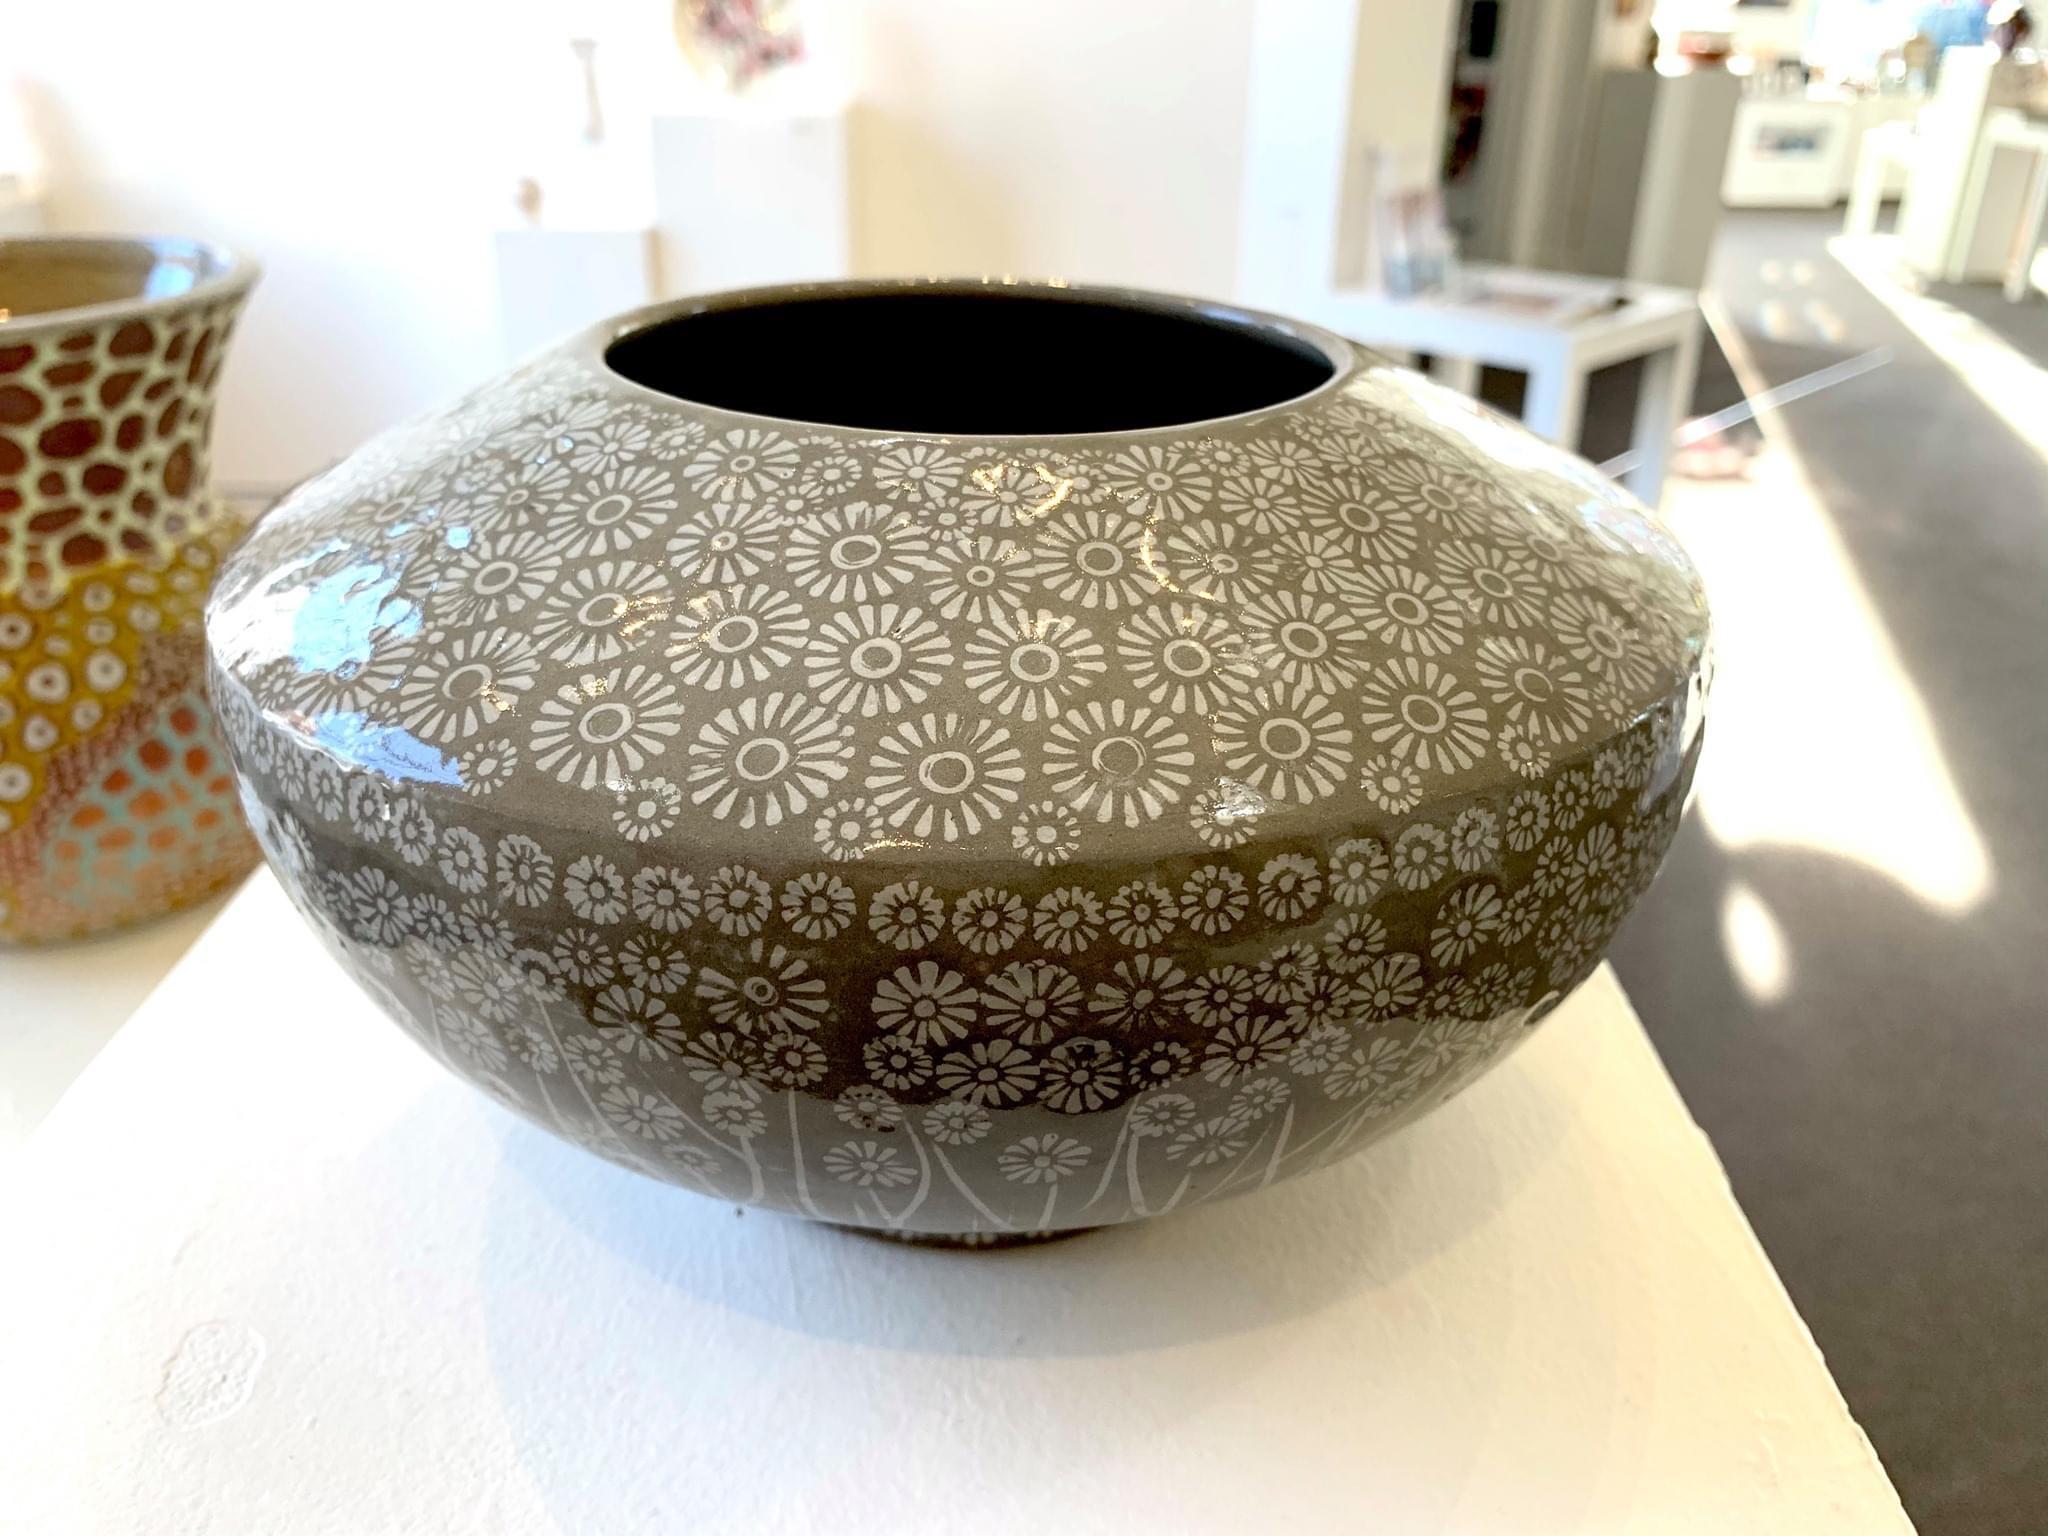 Bunchong vase